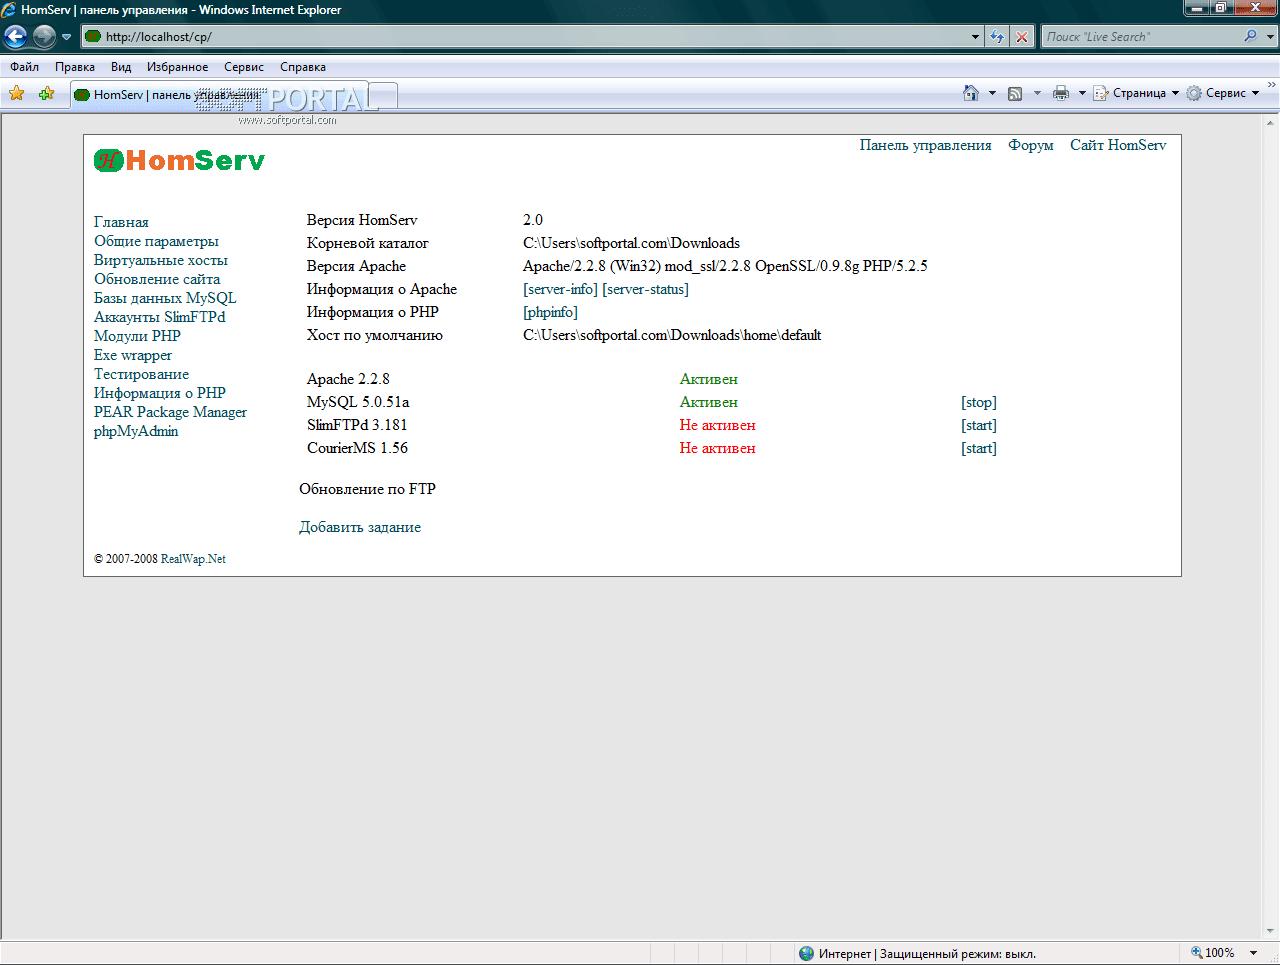 http://www.softportal.com/scr/6044/homserv-big-1.png